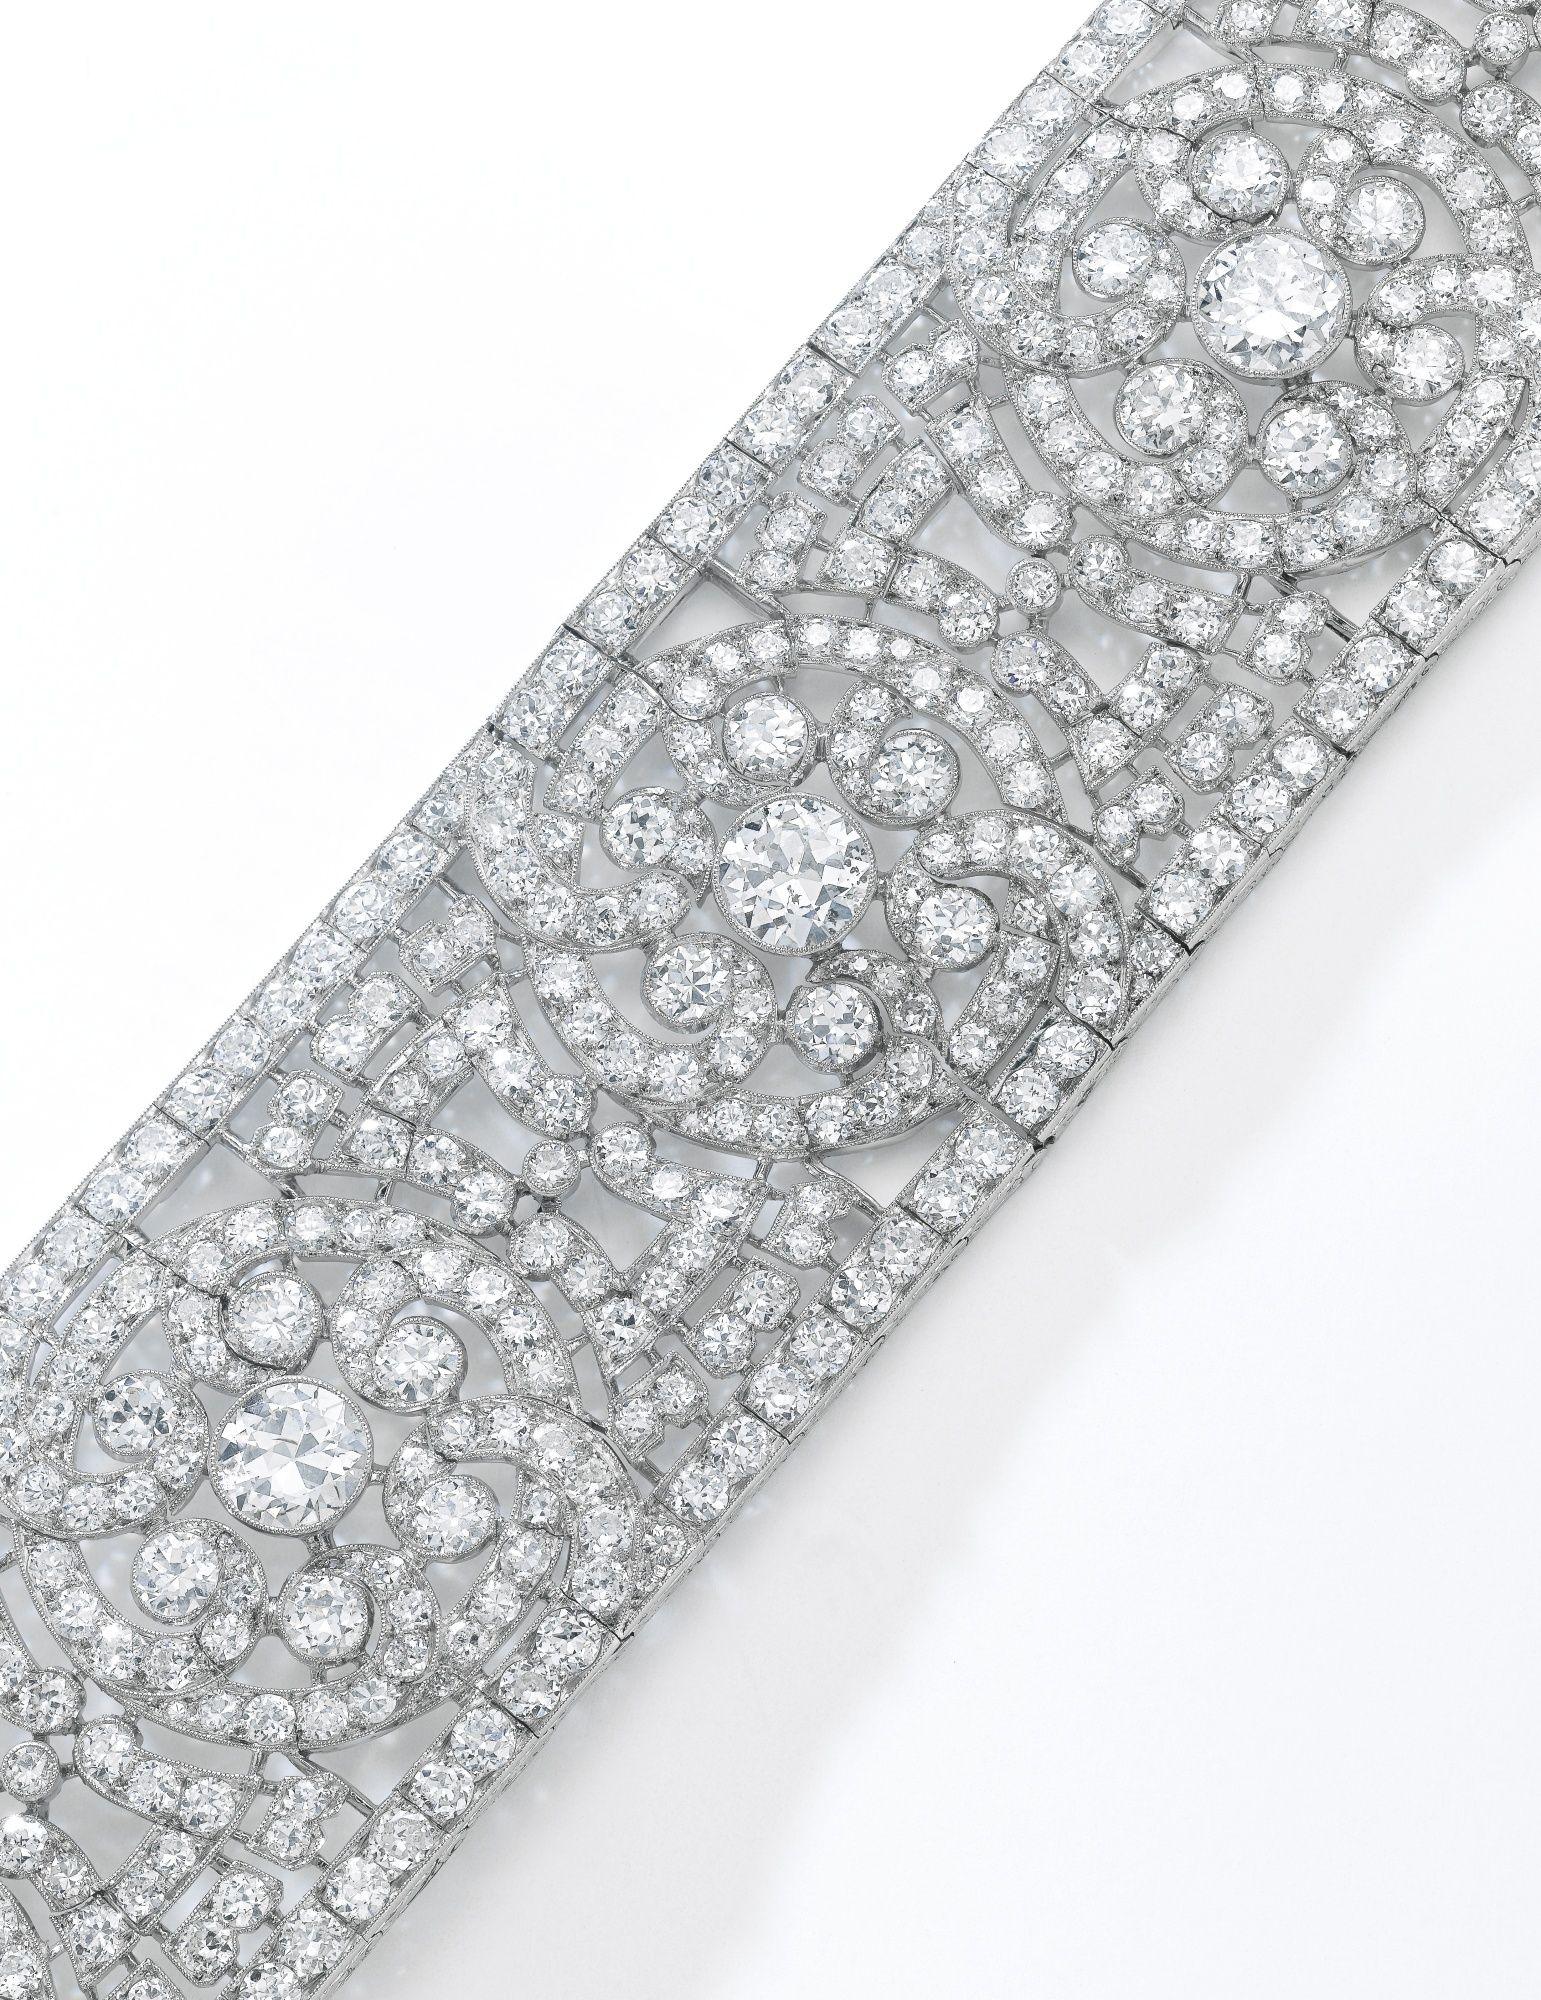 Fine diamond bracelet van cleef u arpels s of scroll and open